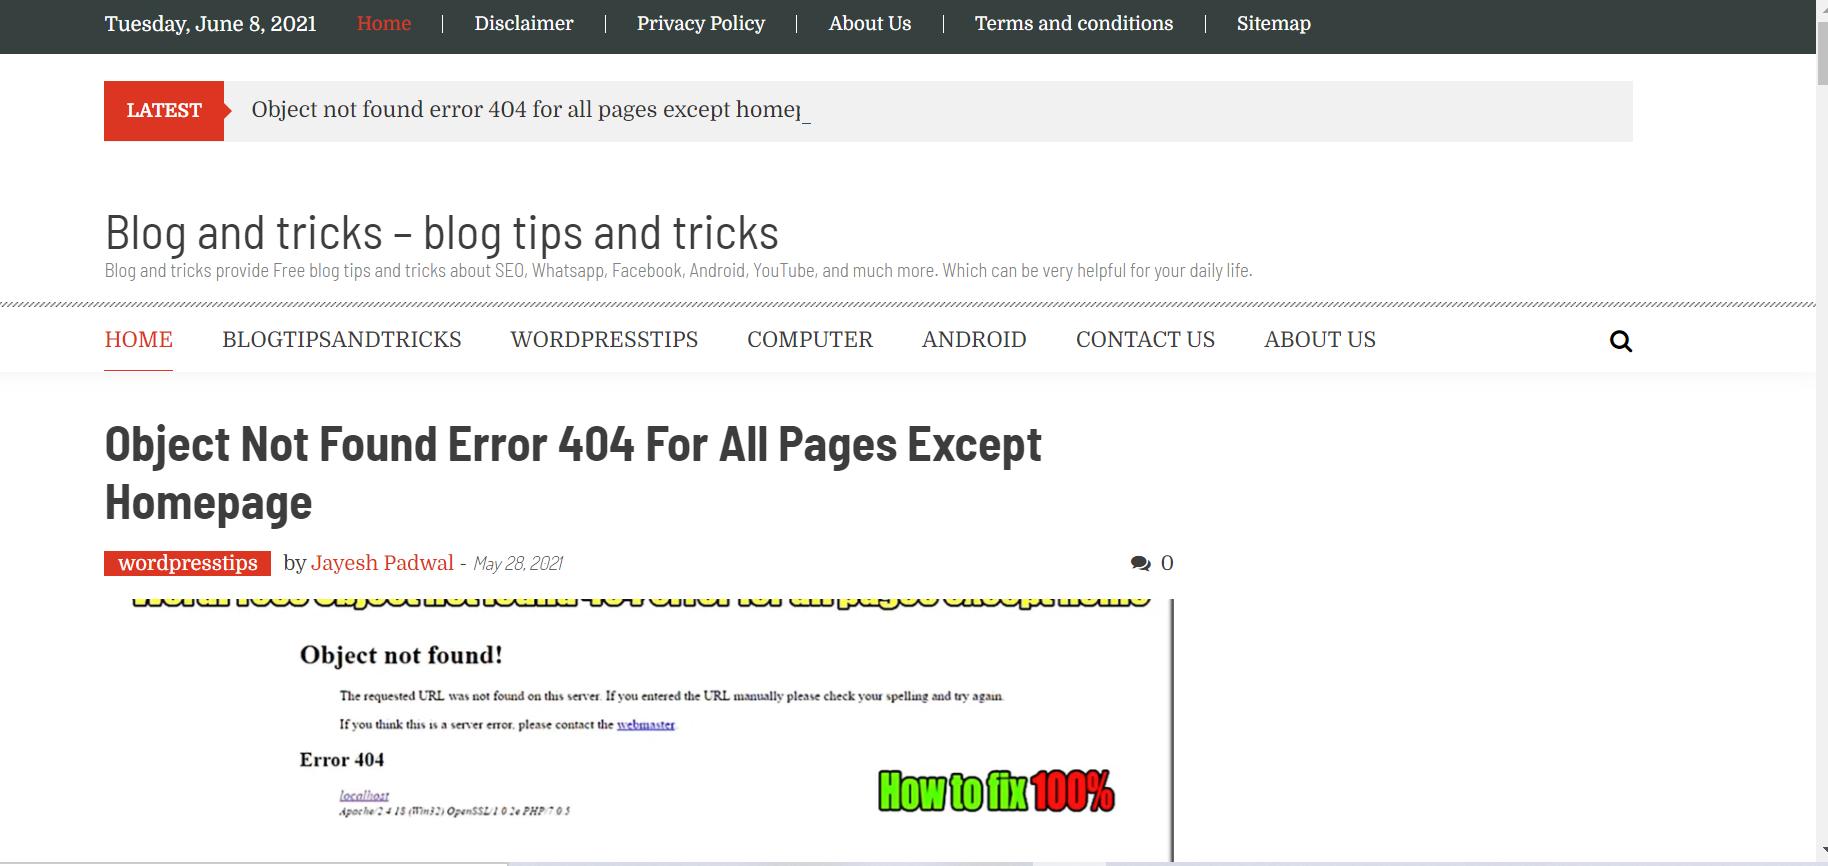 blog and tricks